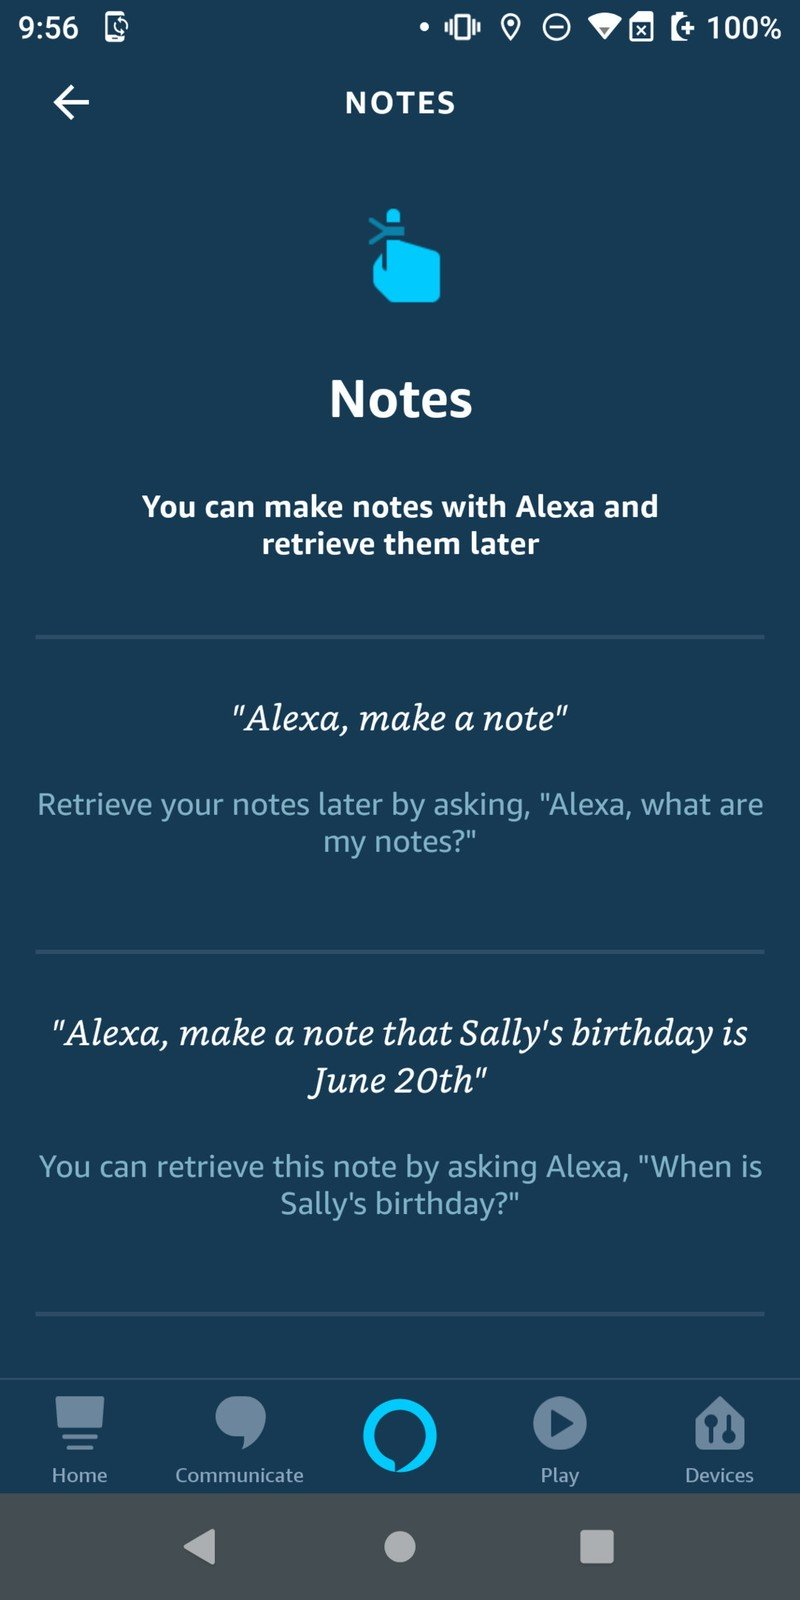 alexa-notes-4.jpg?itok=2V4WkYBC